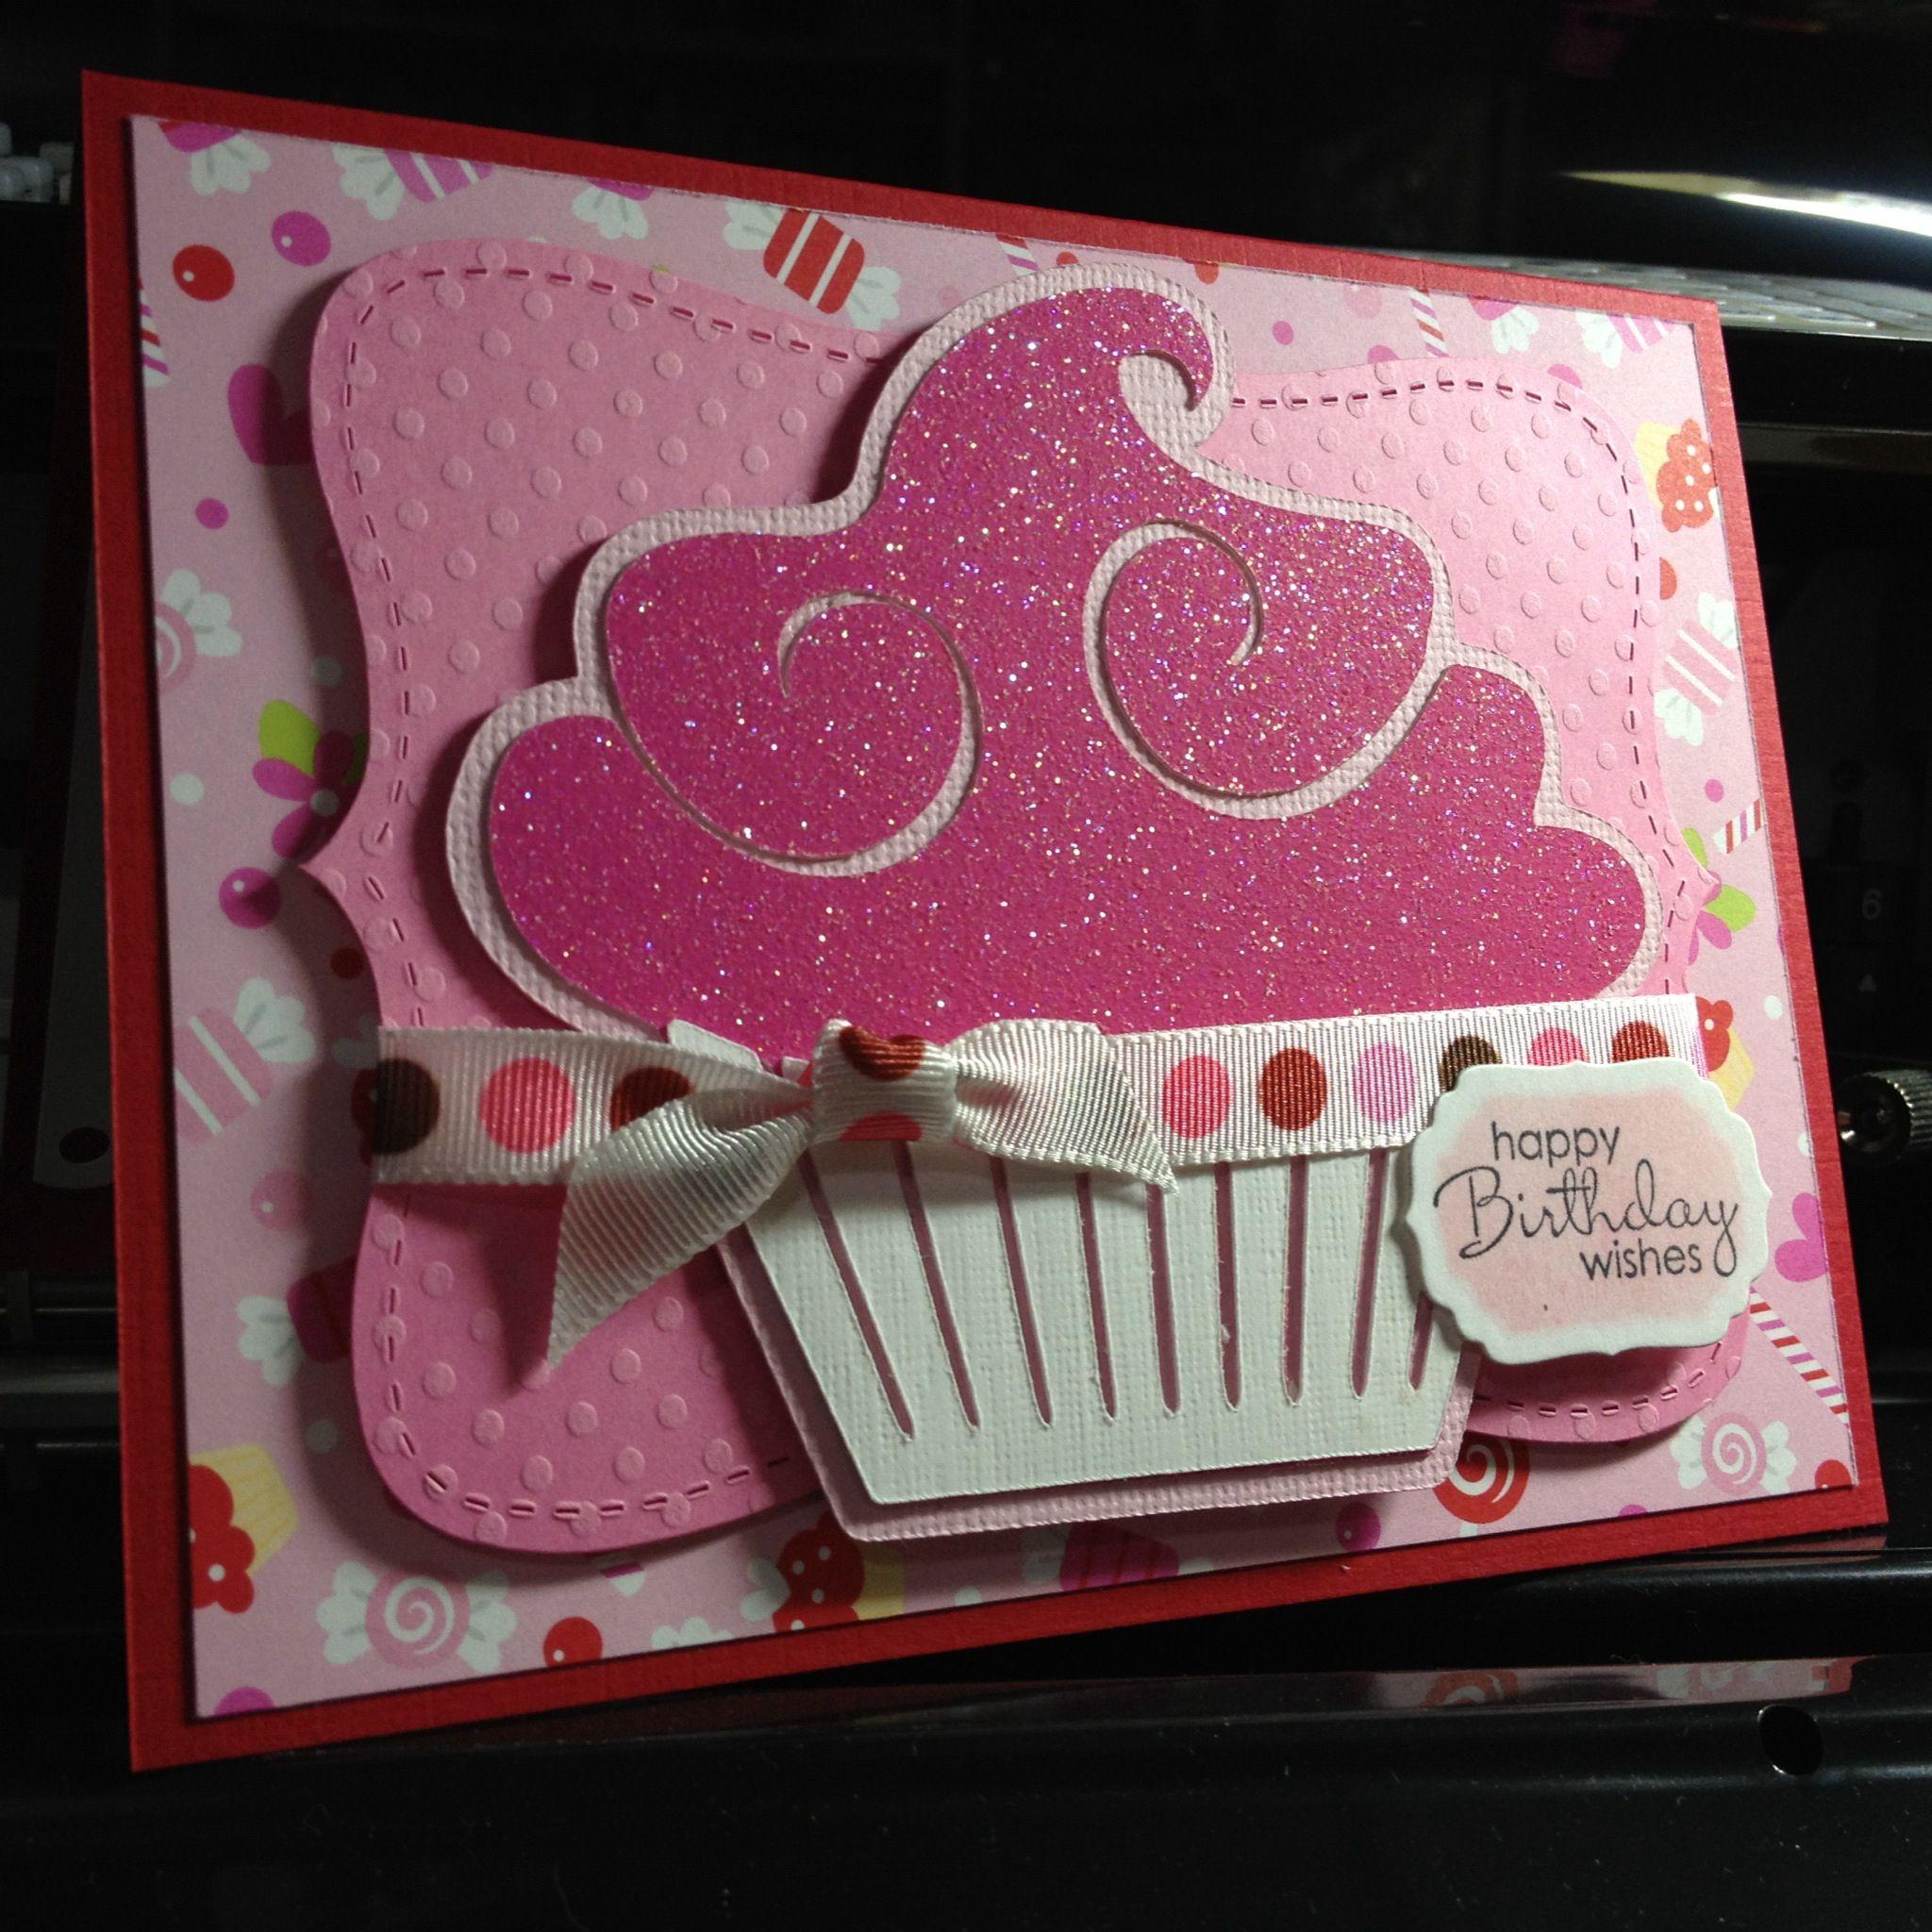 Cupcake Birthday Card Using Cricut Cake Basics Cartridge